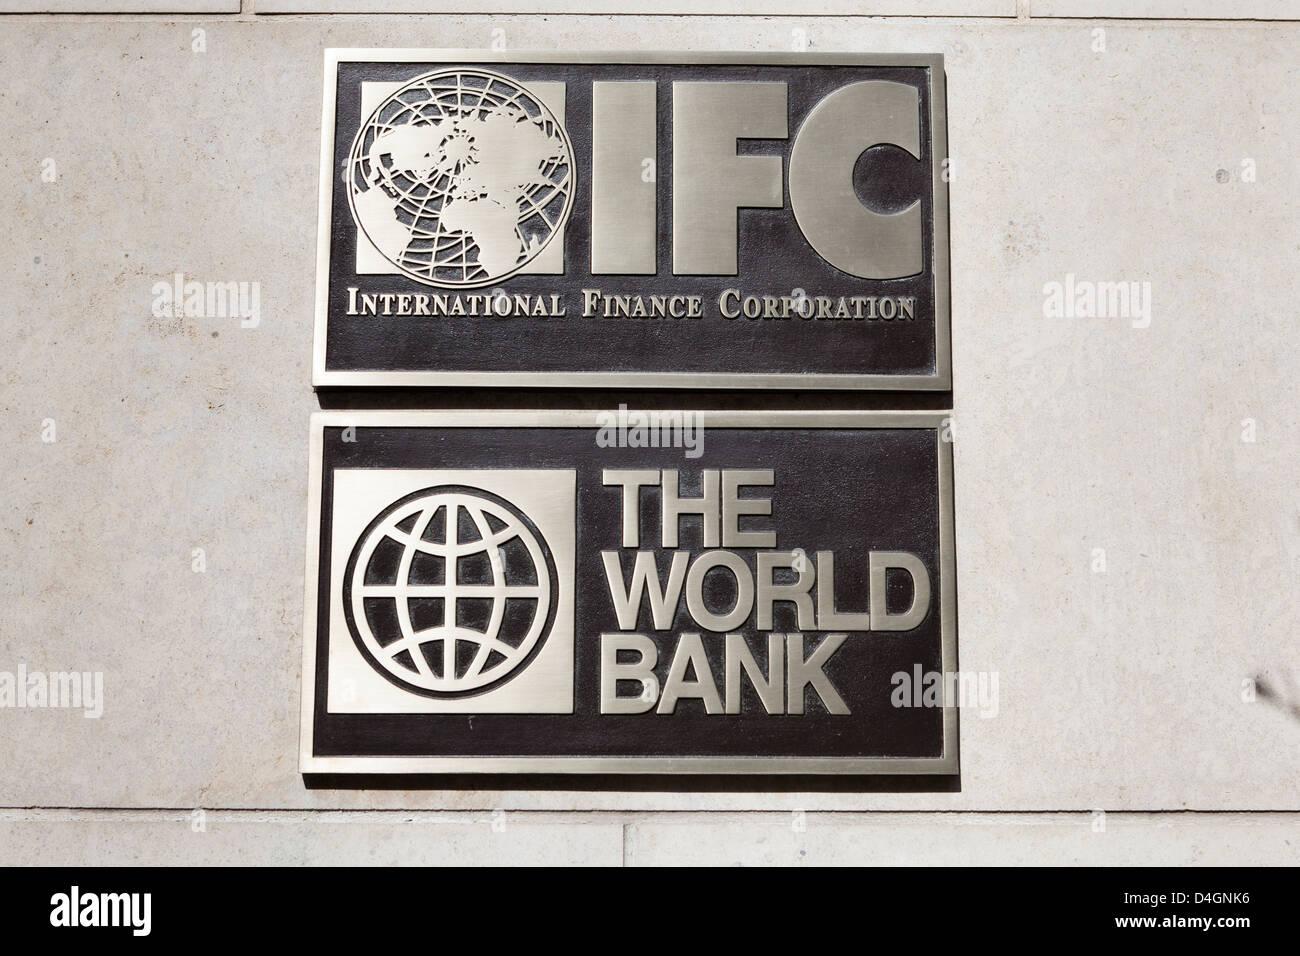 The World Bank, IFC building plaque - Washington, DC USA - Stock Image